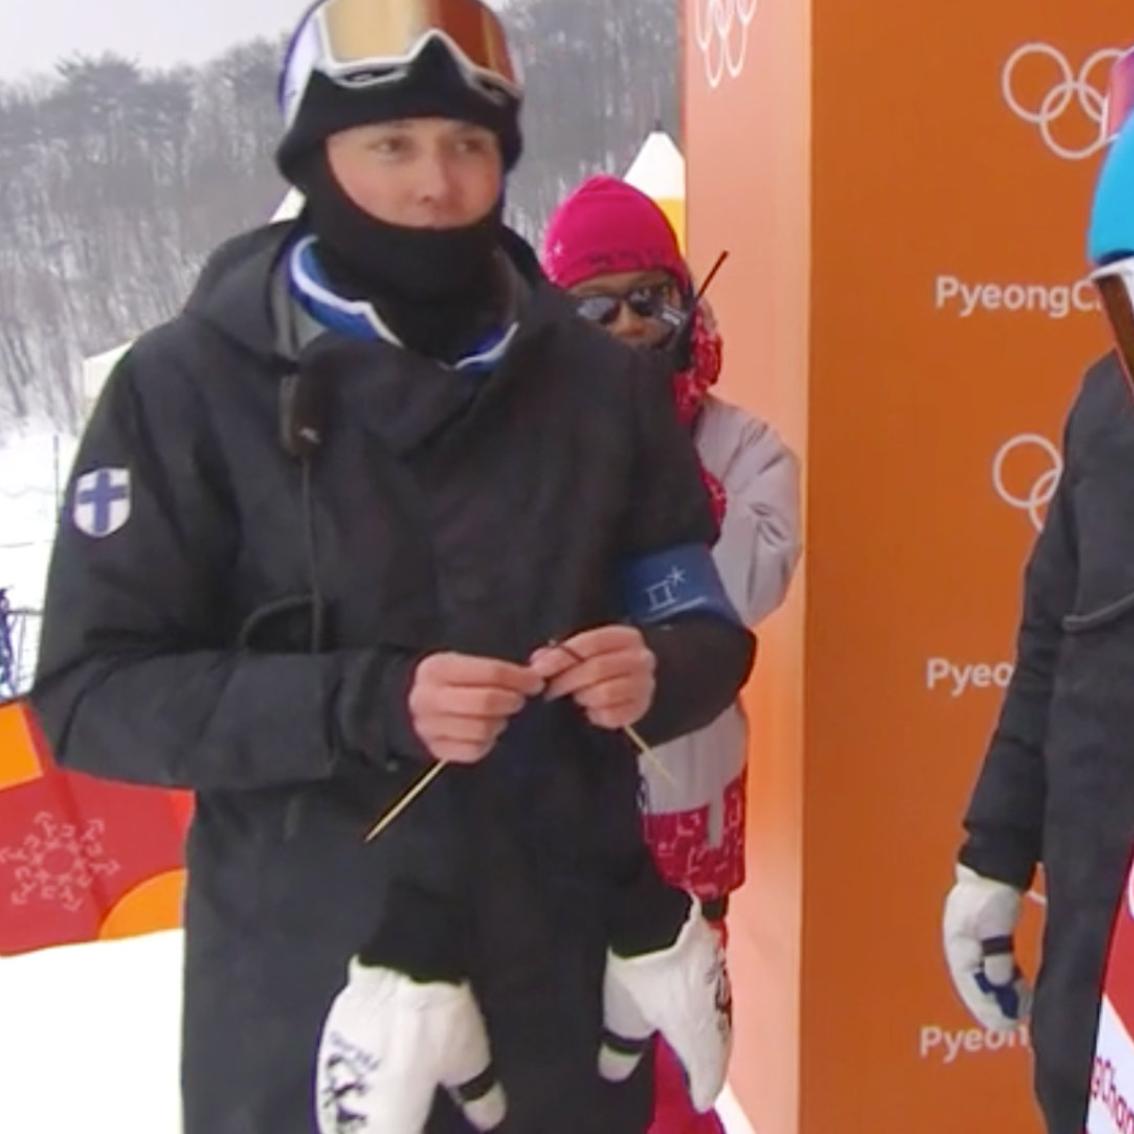 Finland Ski Coach Knitting!